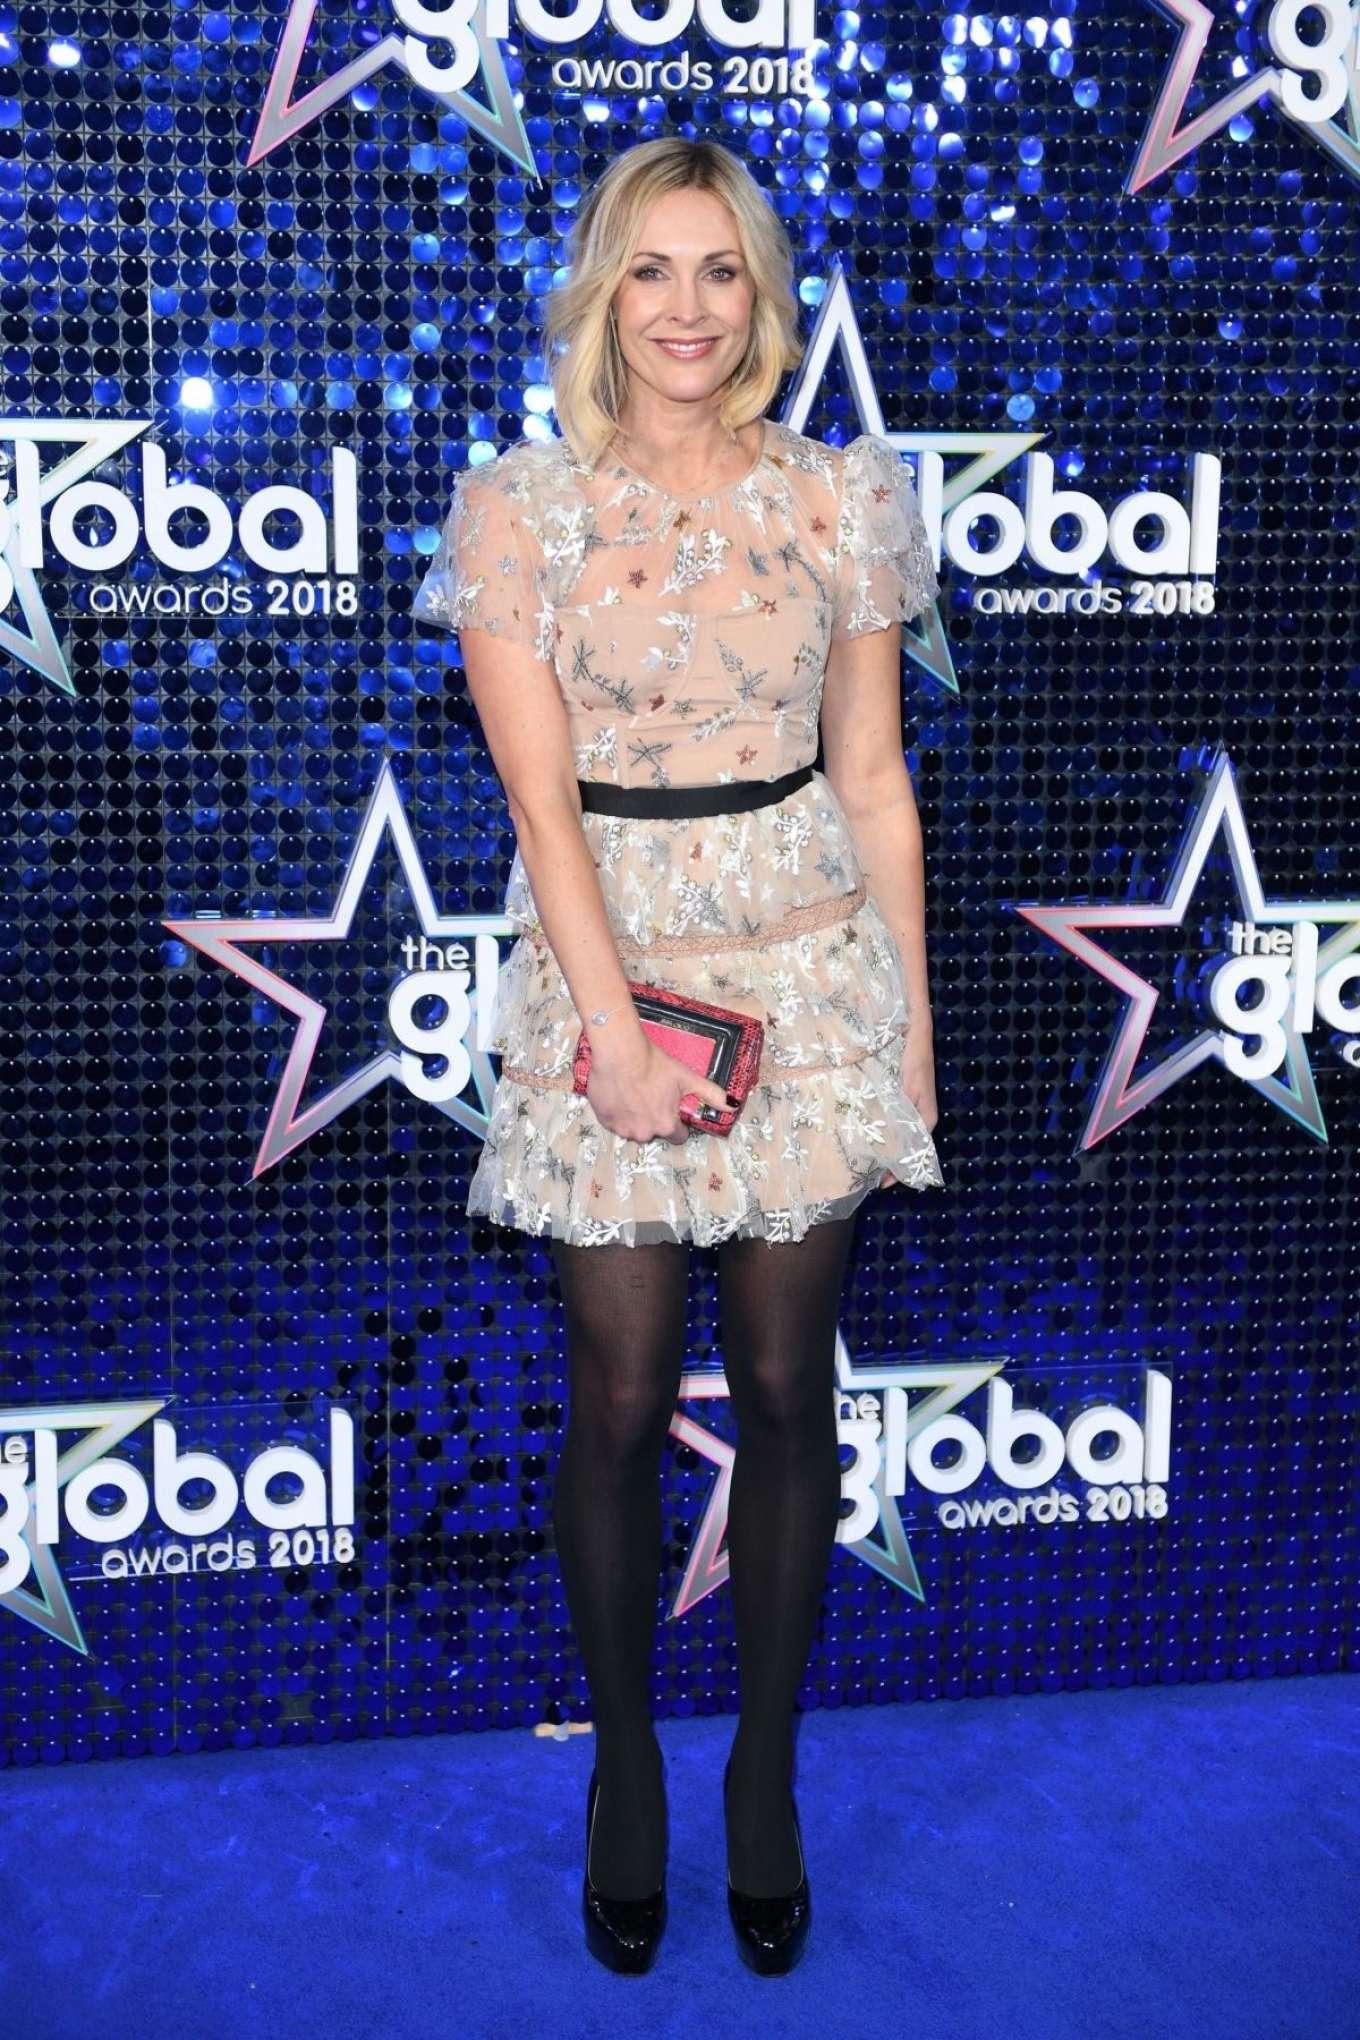 Jenni Falconer 2018 : Jenni Falconer: 2018 Global Awards -04